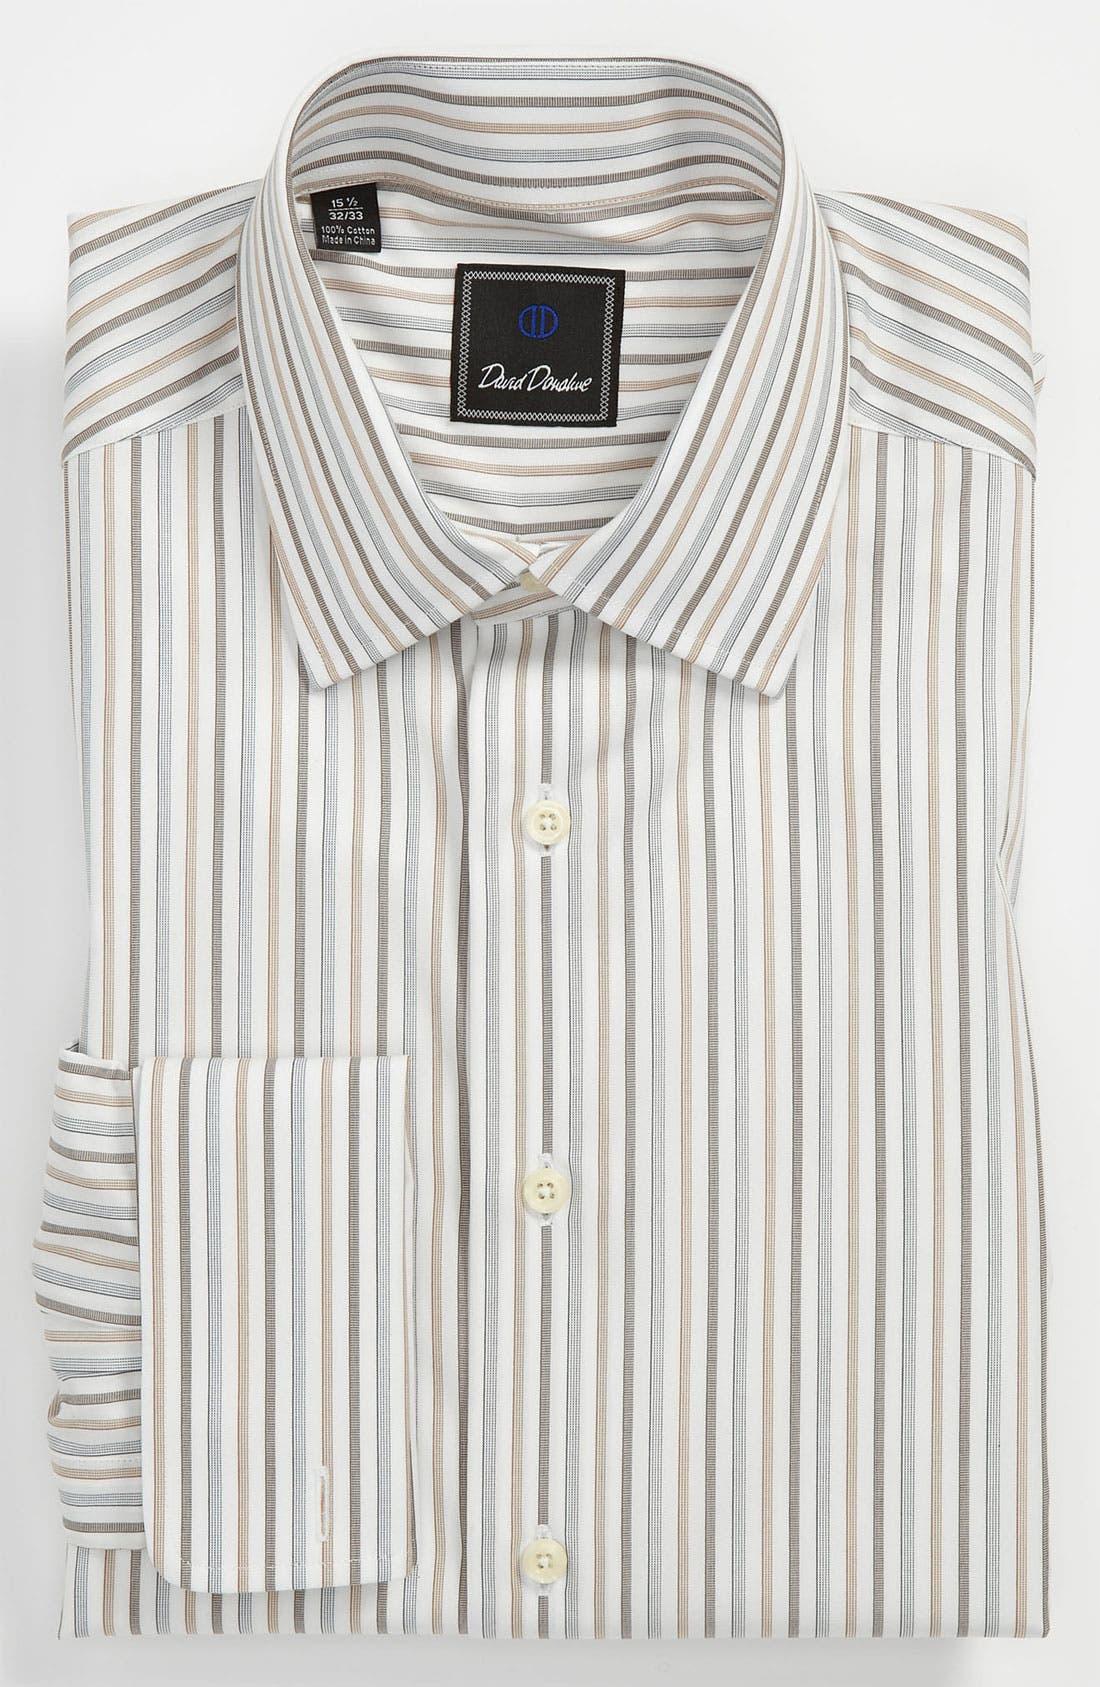 Alternate Image 1 Selected - David Donahue Regular Fit Dress Shirt